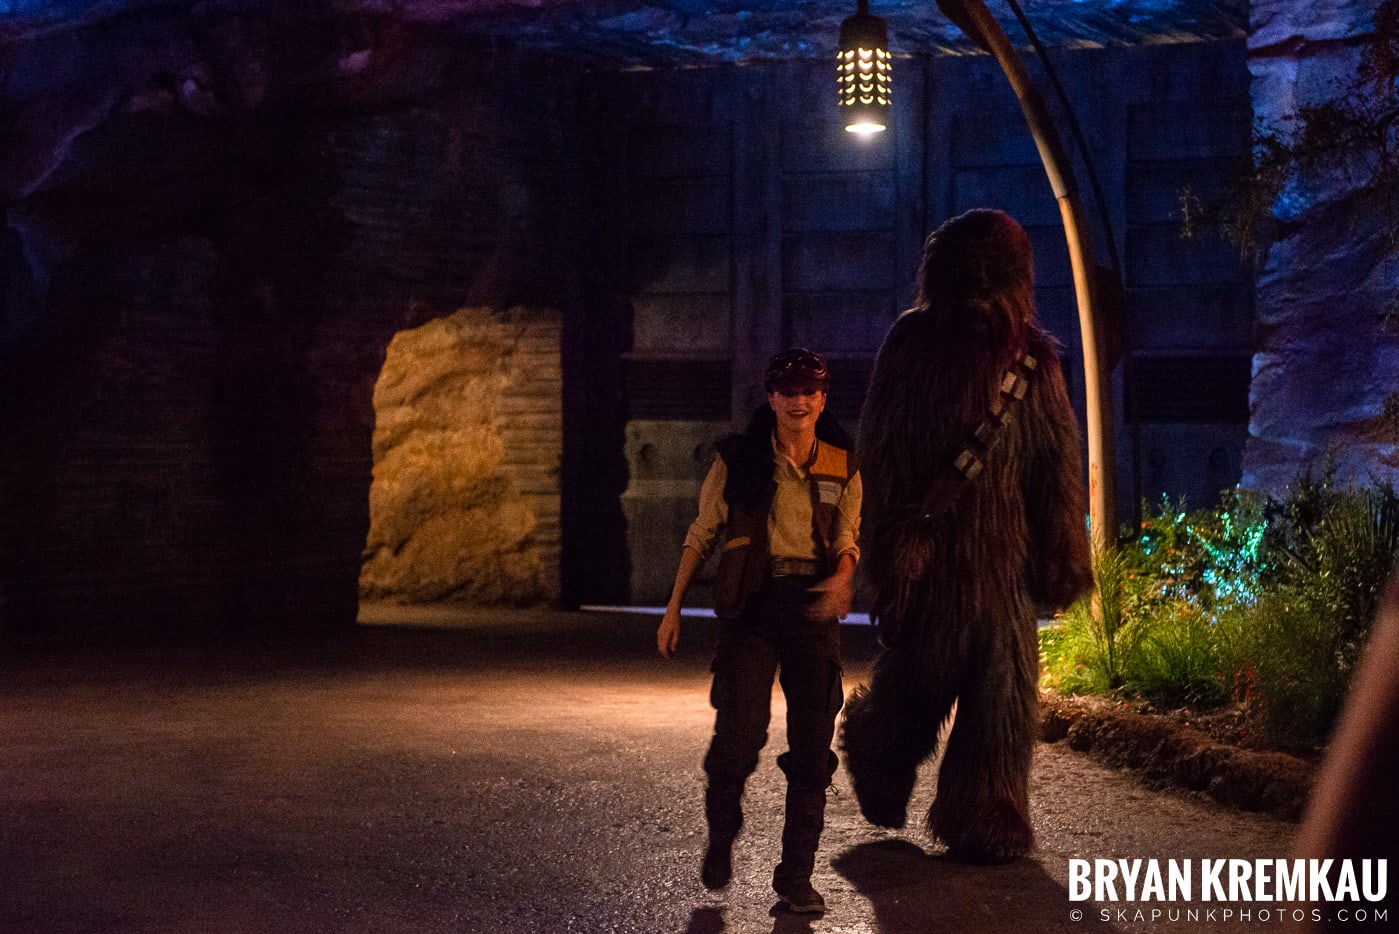 Walt Disney World Vacation: Day 6 (Magic Kingdom, Epcot, Disney's Hollywood Studios) - 10.4.19 (27)